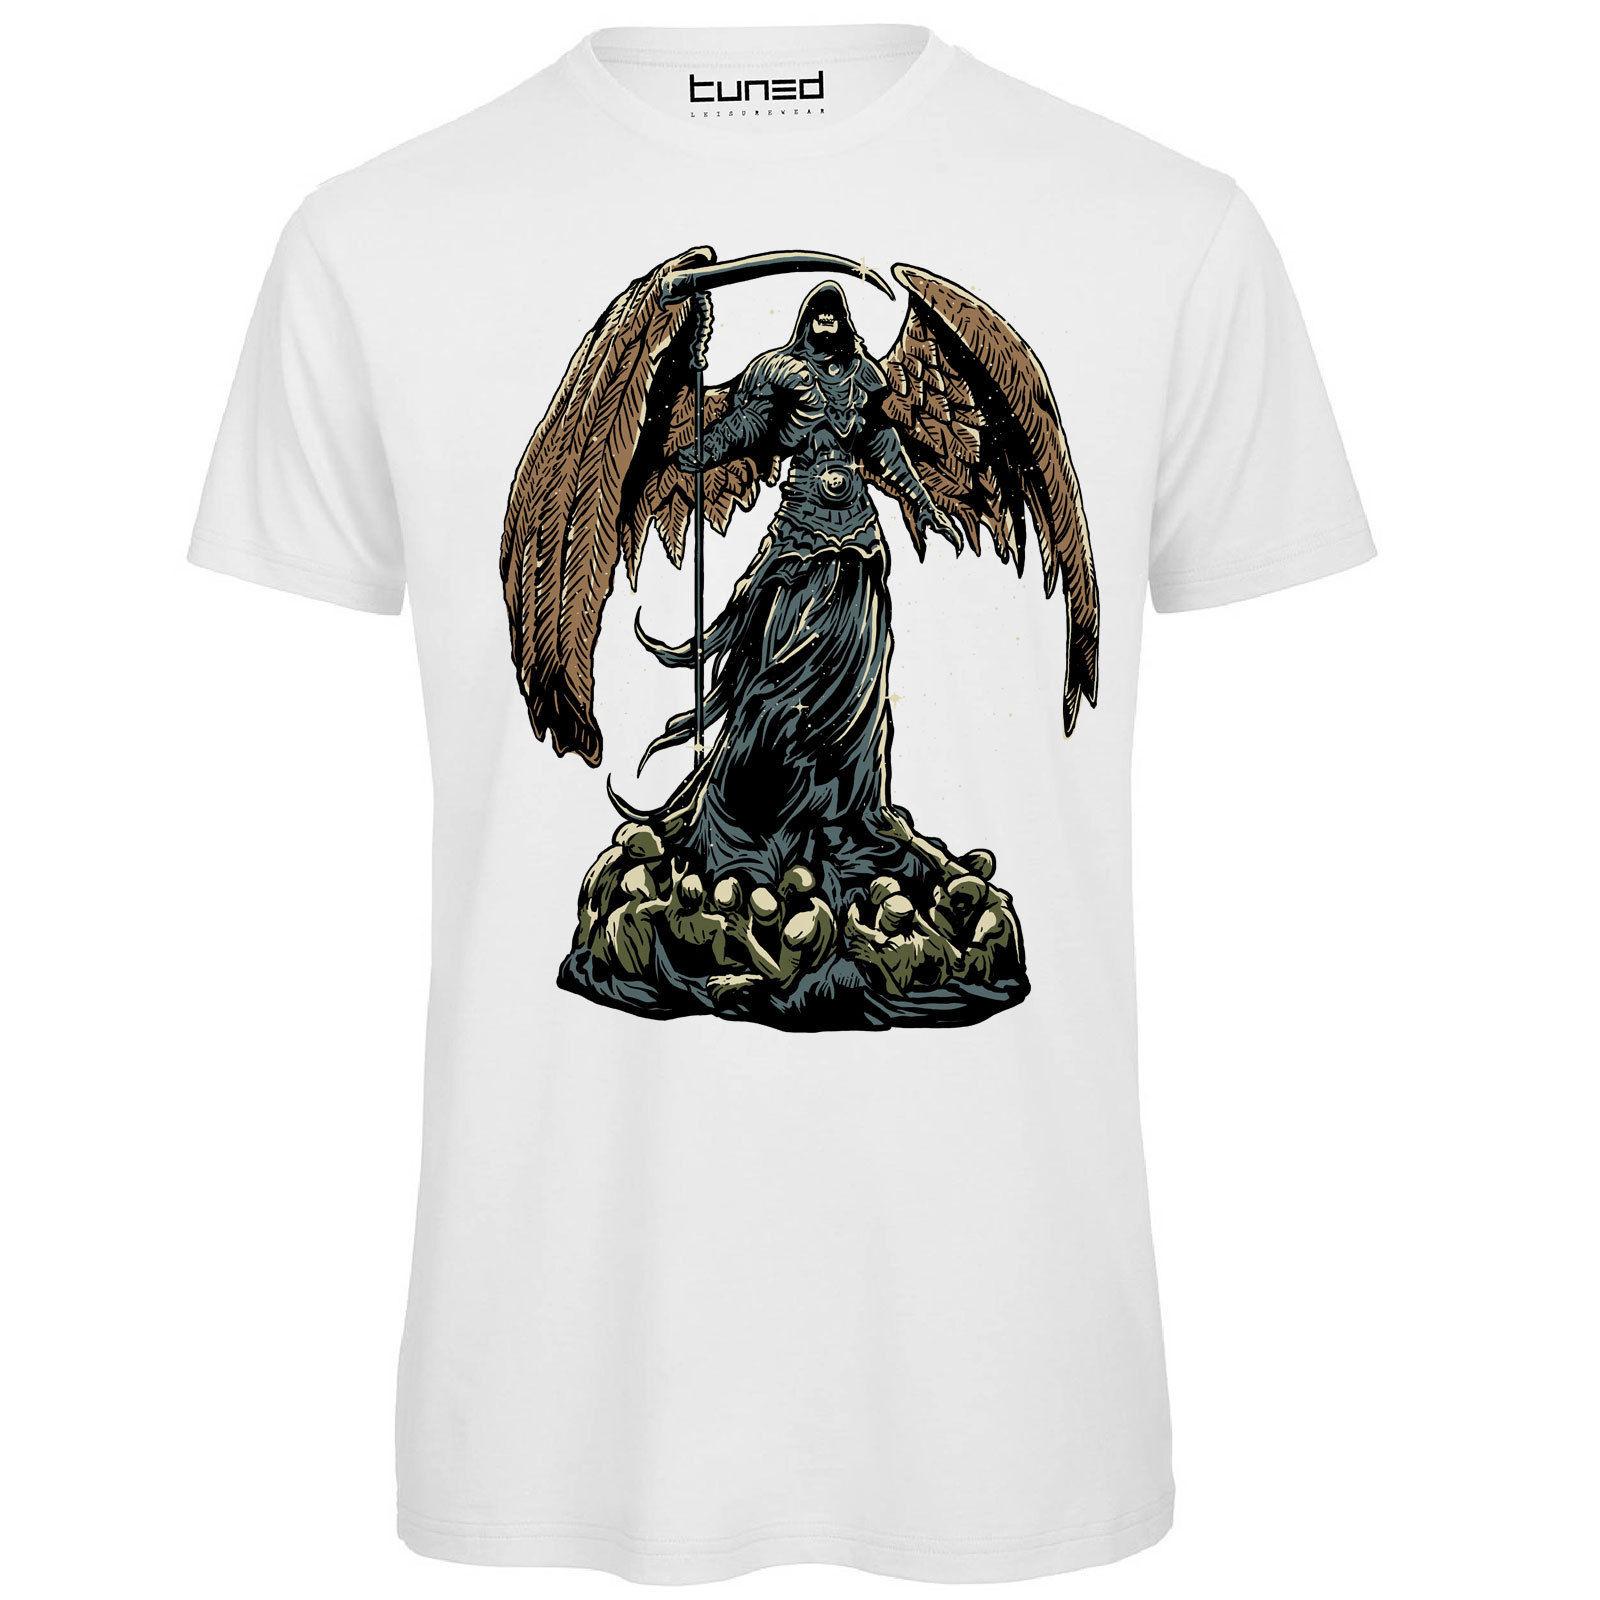 Vêtements Accessoires Cool T Shirt Hommes Skull Rocker